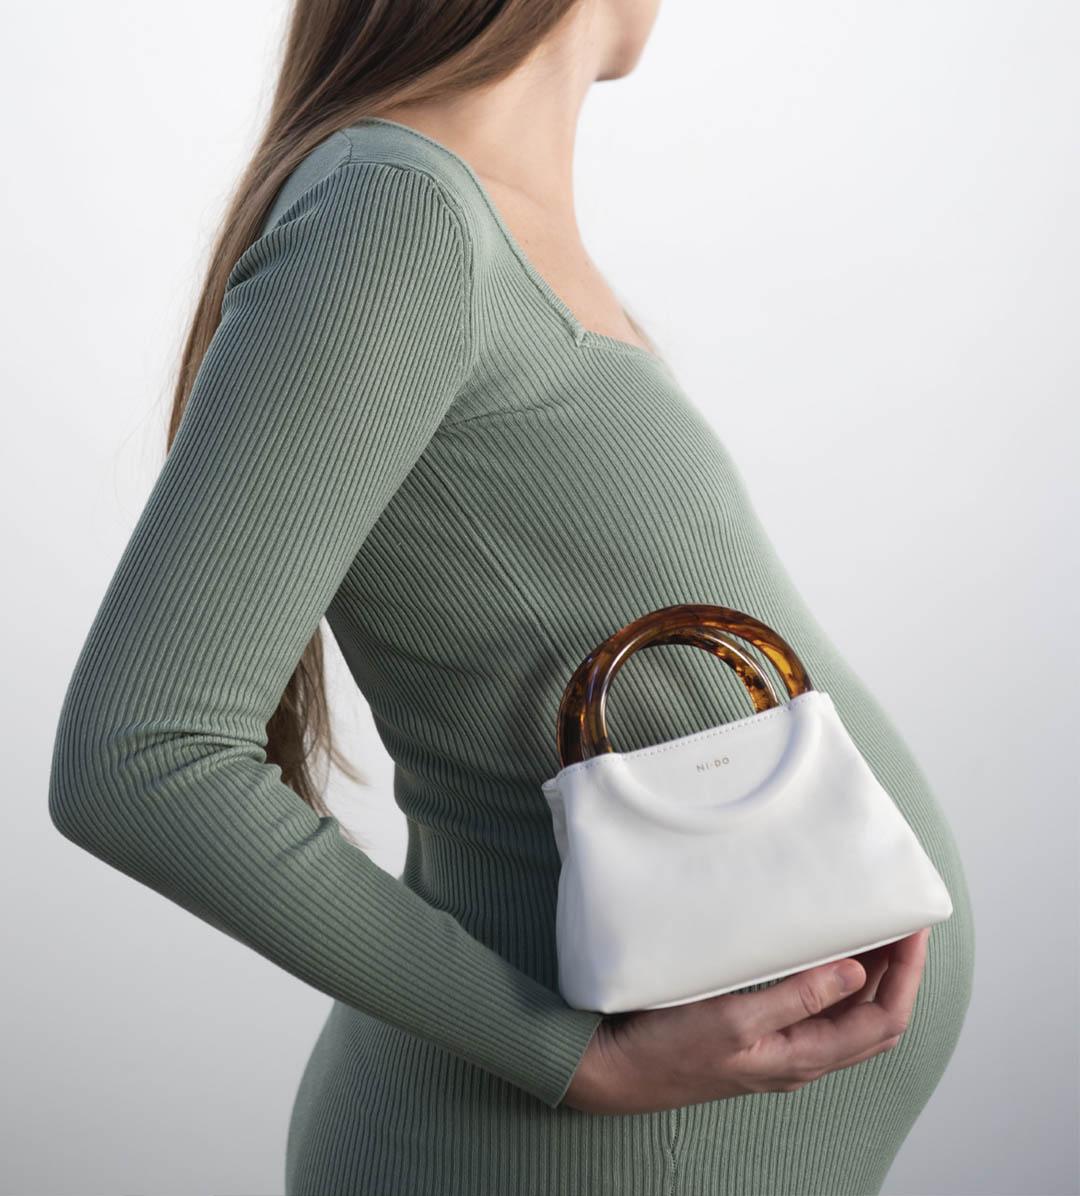 NIDO Bolla Micro bag hold by a pregnant woman